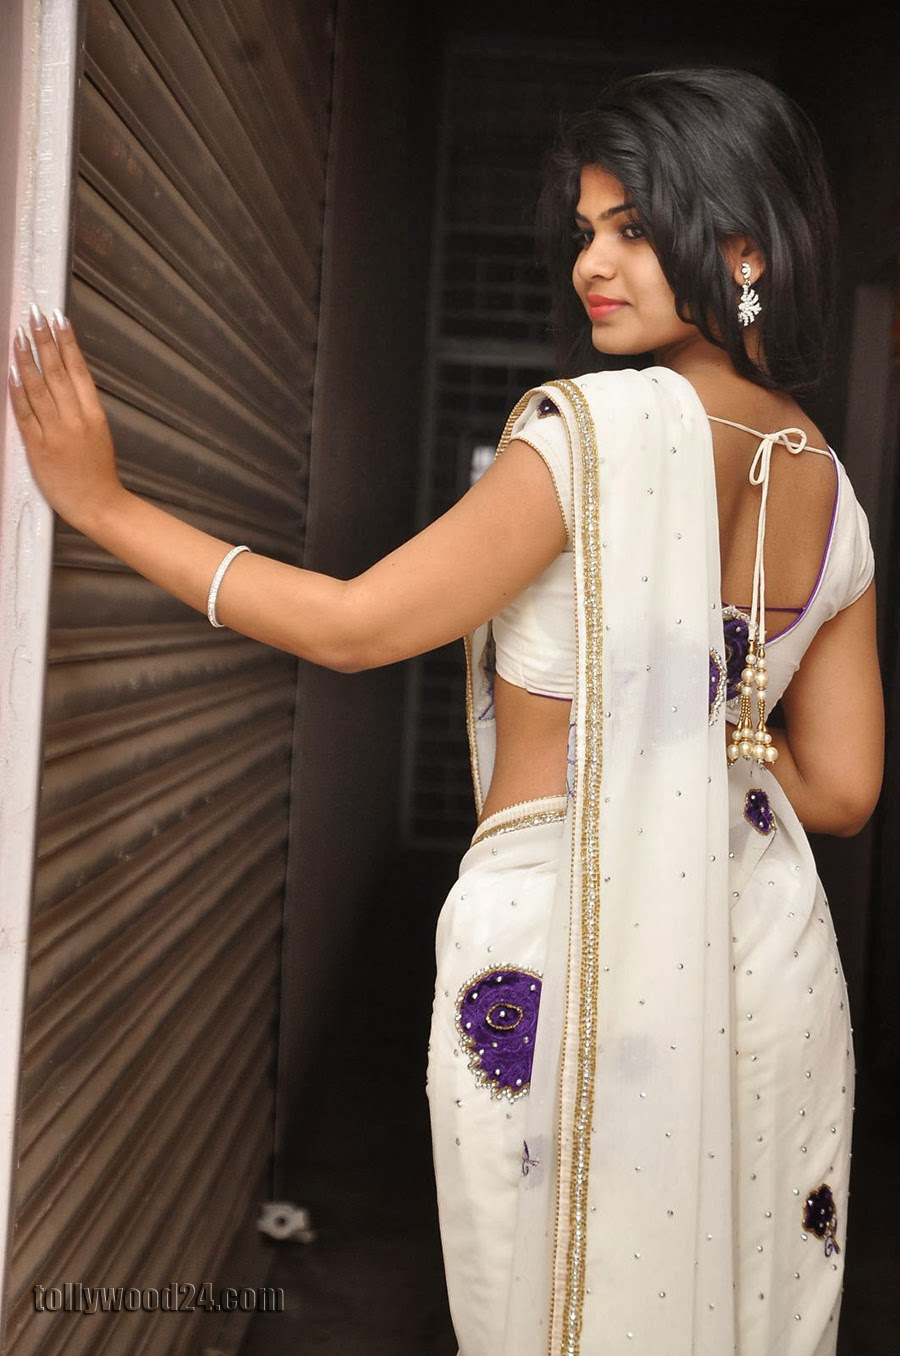 Alekhya Latest Photos in Saree at Donga Prema Audio-HQ-Photo-15